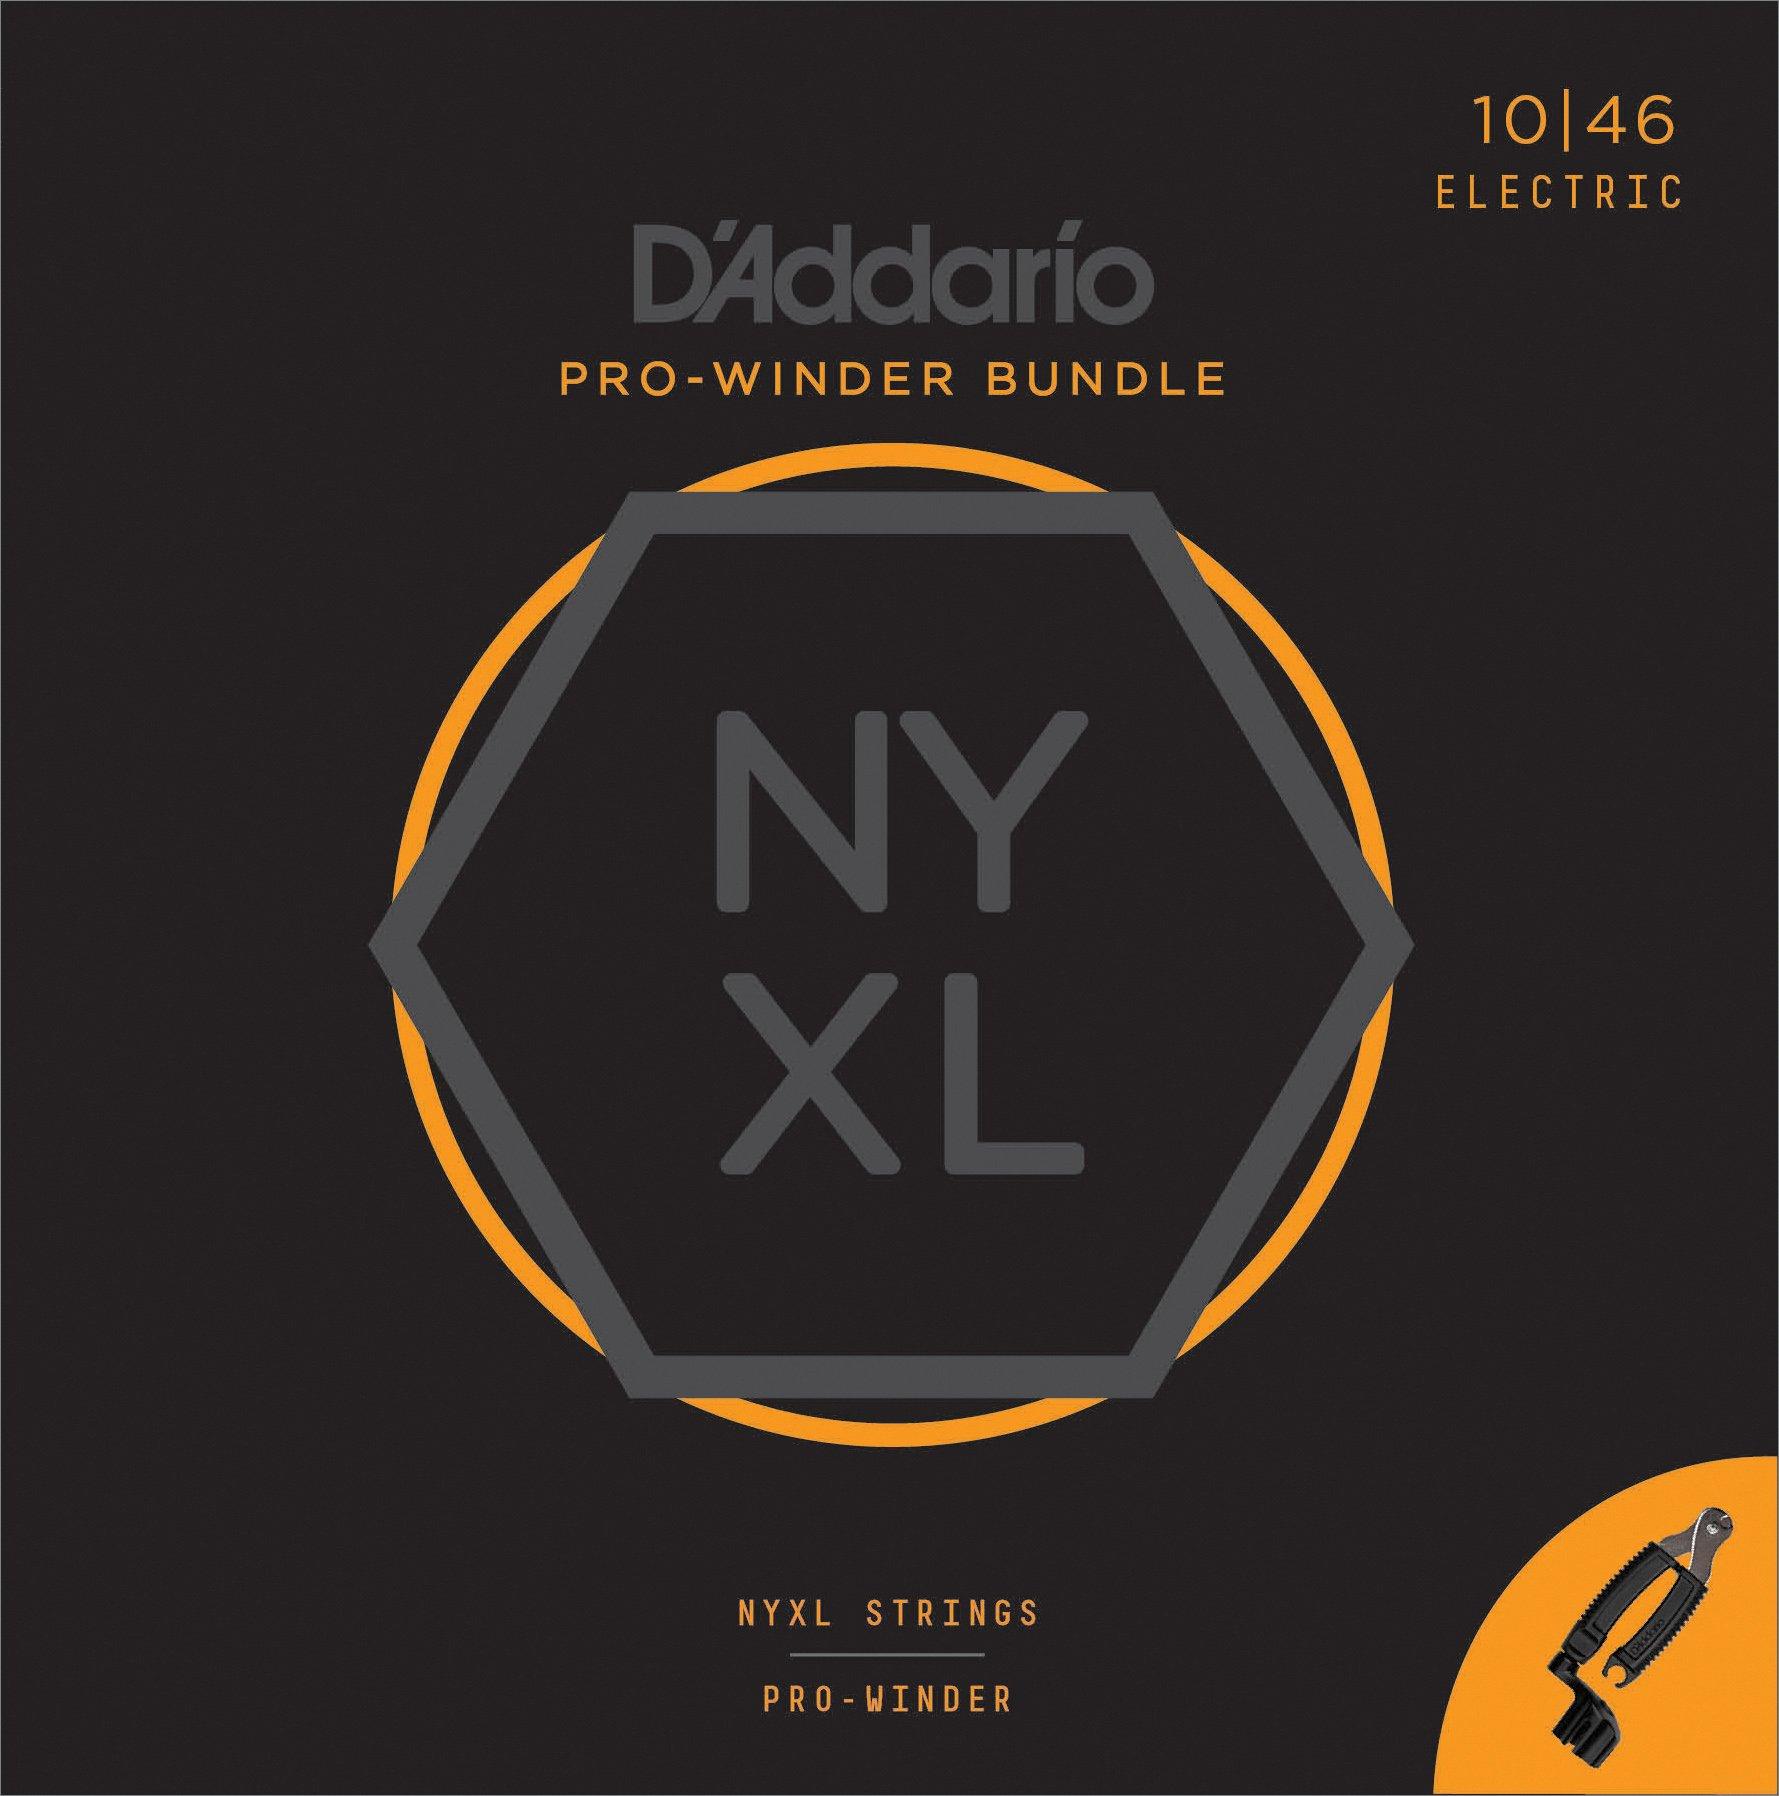 D'Addario NYXL1046 Nickel Wound Electric Guitar Strings, Regular Light & Pro-Winder Bundle